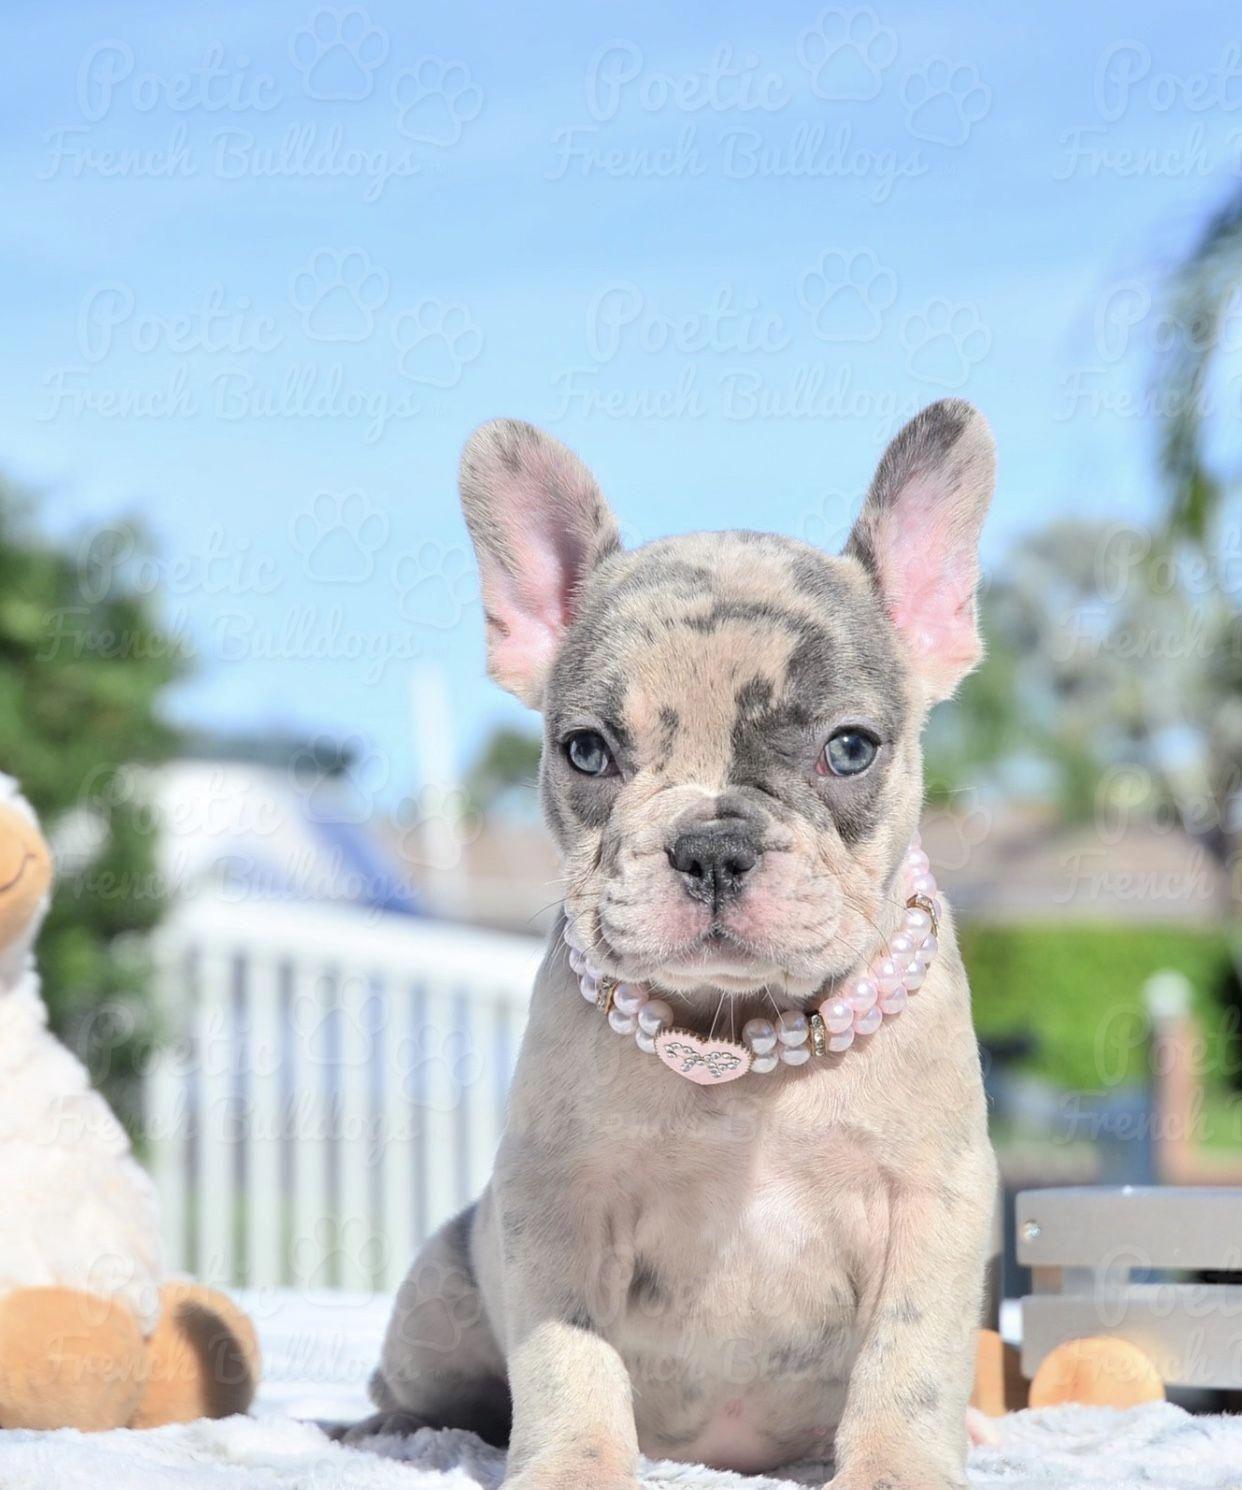 Nova Blue Eyed Blue Merle Female Available Www Poeticfrenchbulldogs Com French Bulldog Puppies For Bulldog Puppies French Bulldog Puppies Bulldog